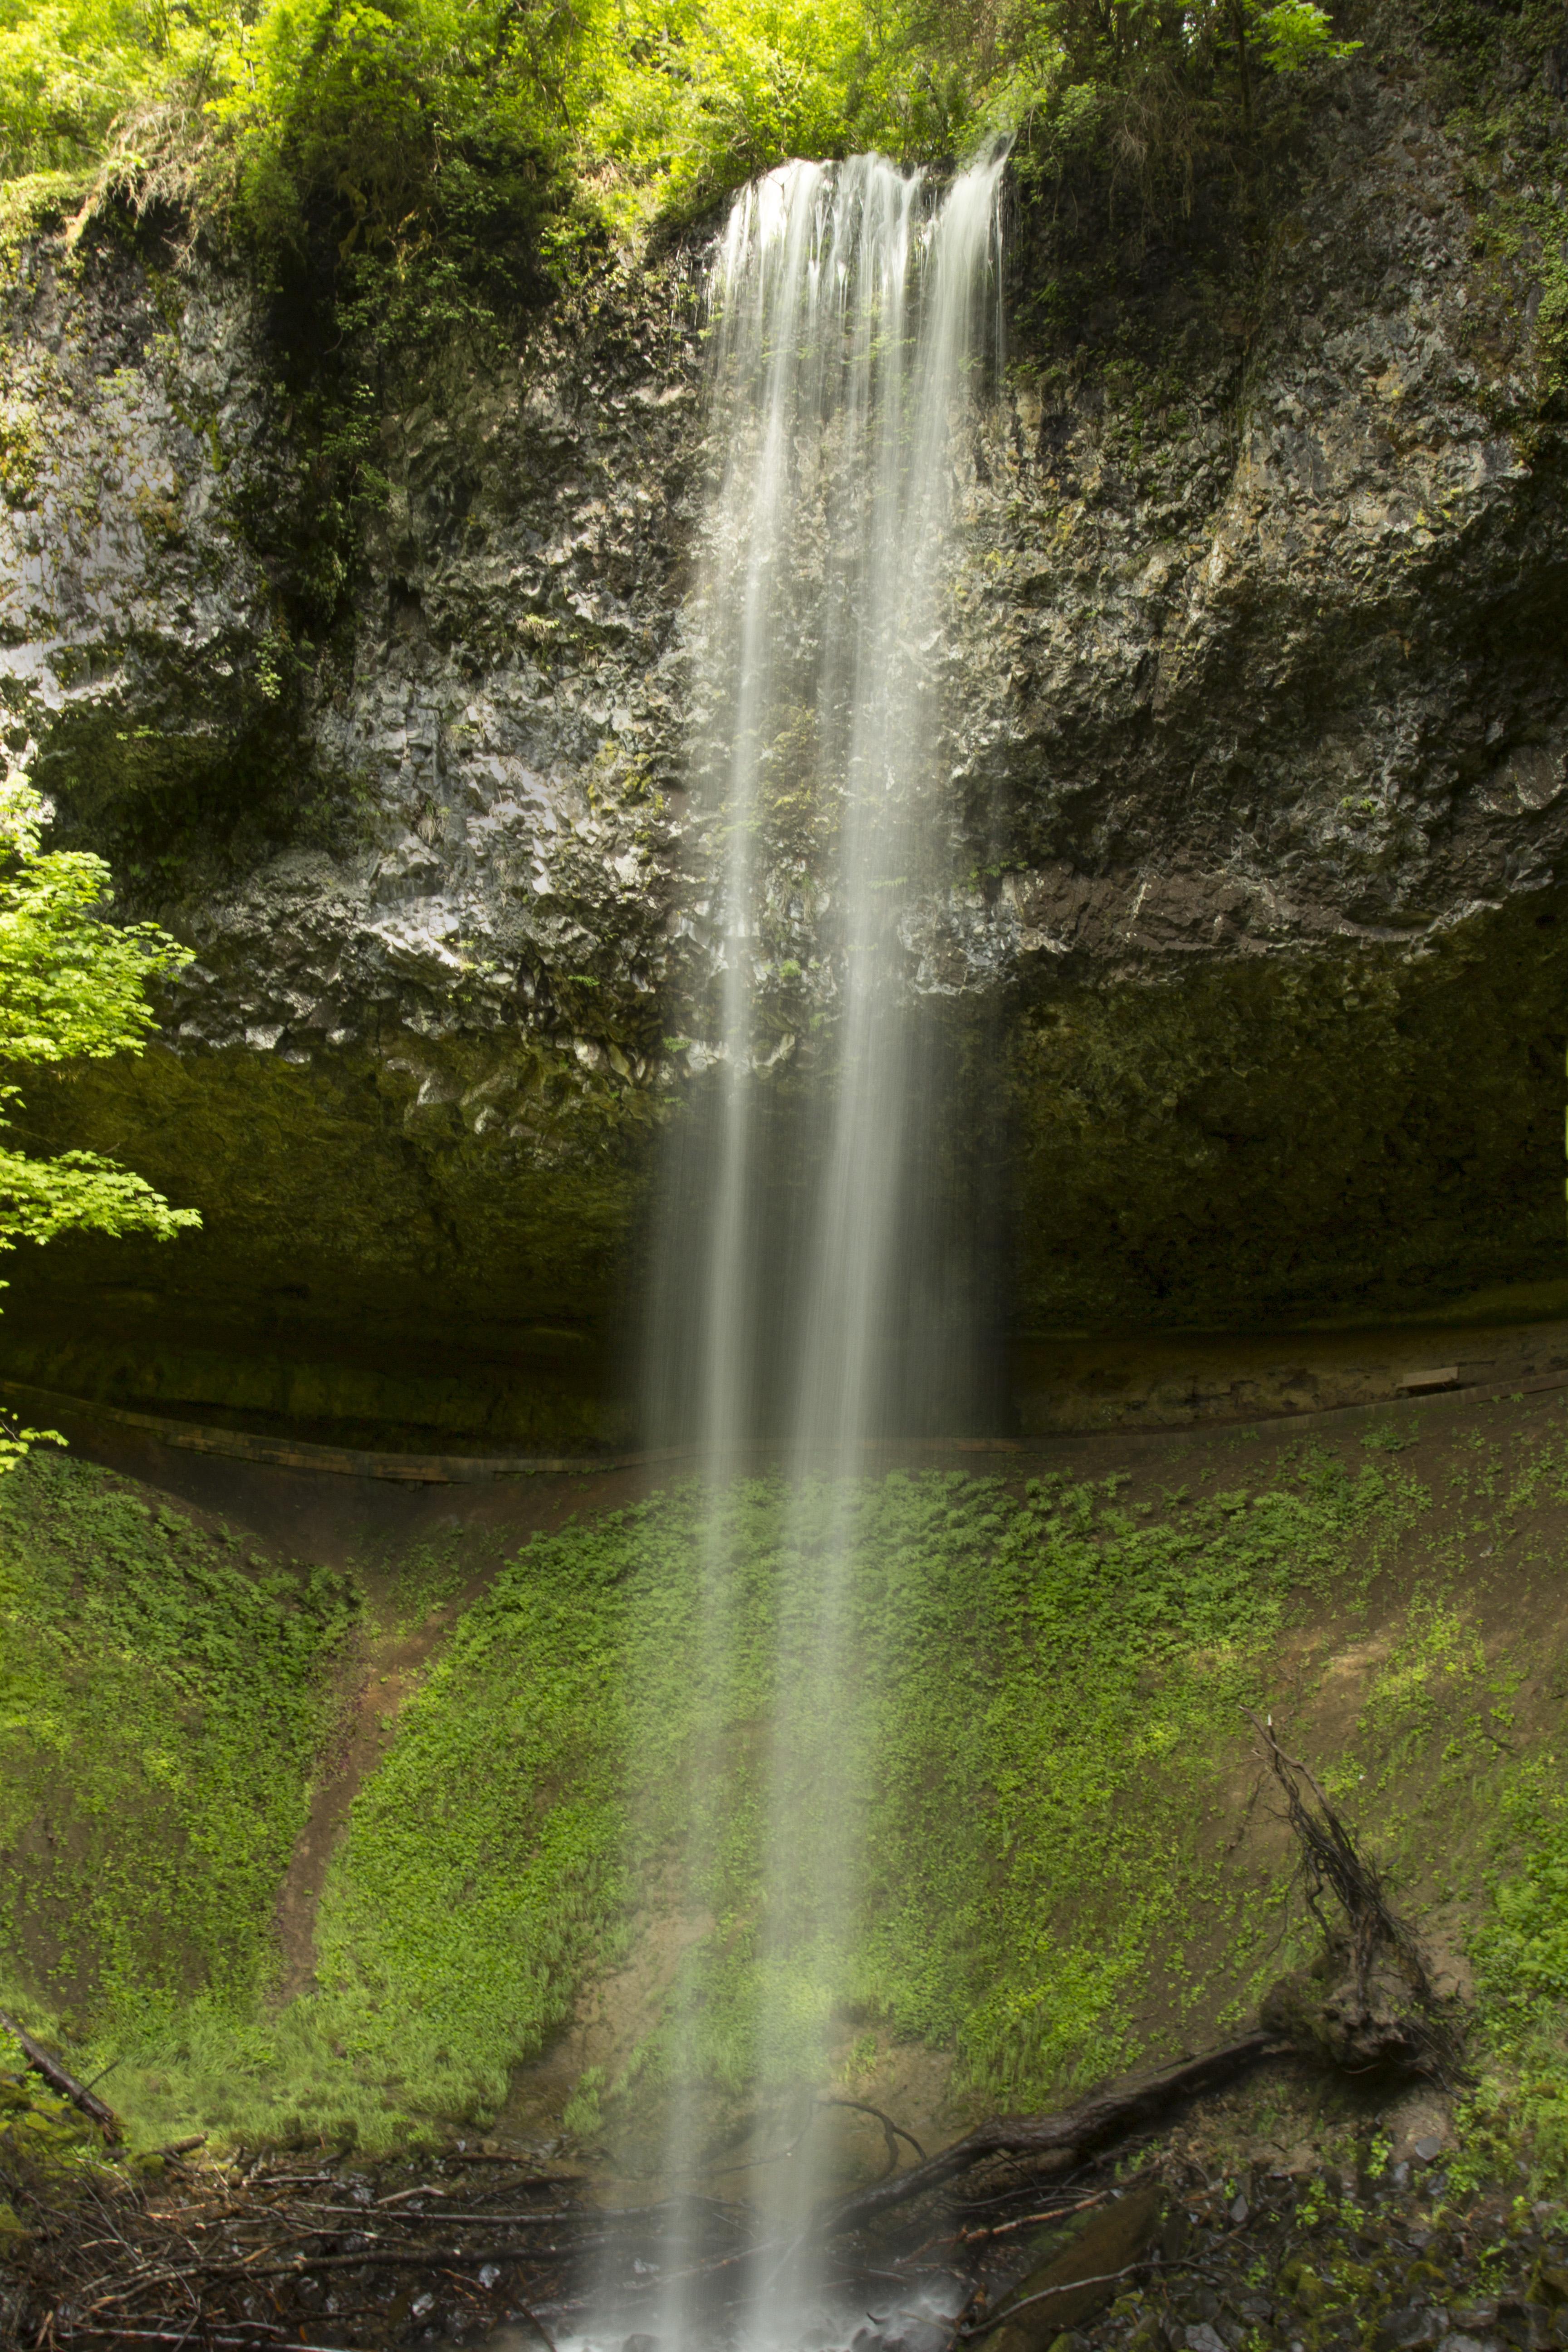 Shellburg Falls, Oregon, Grass, Oregon, Park, Top-f25 (25-49 faves), HQ Photo